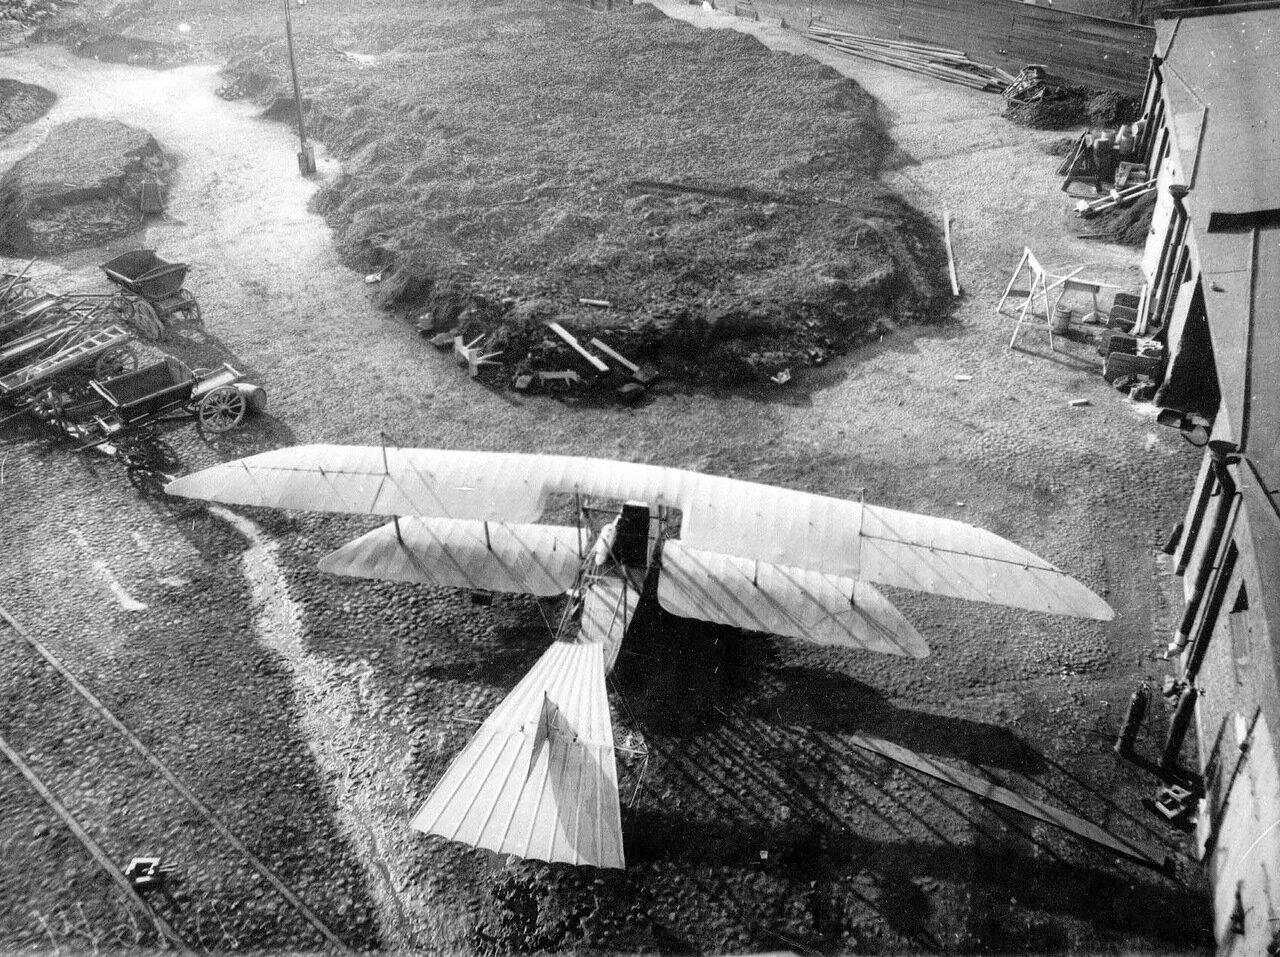 03. Аэроплан во дворе завода (вид сверху)